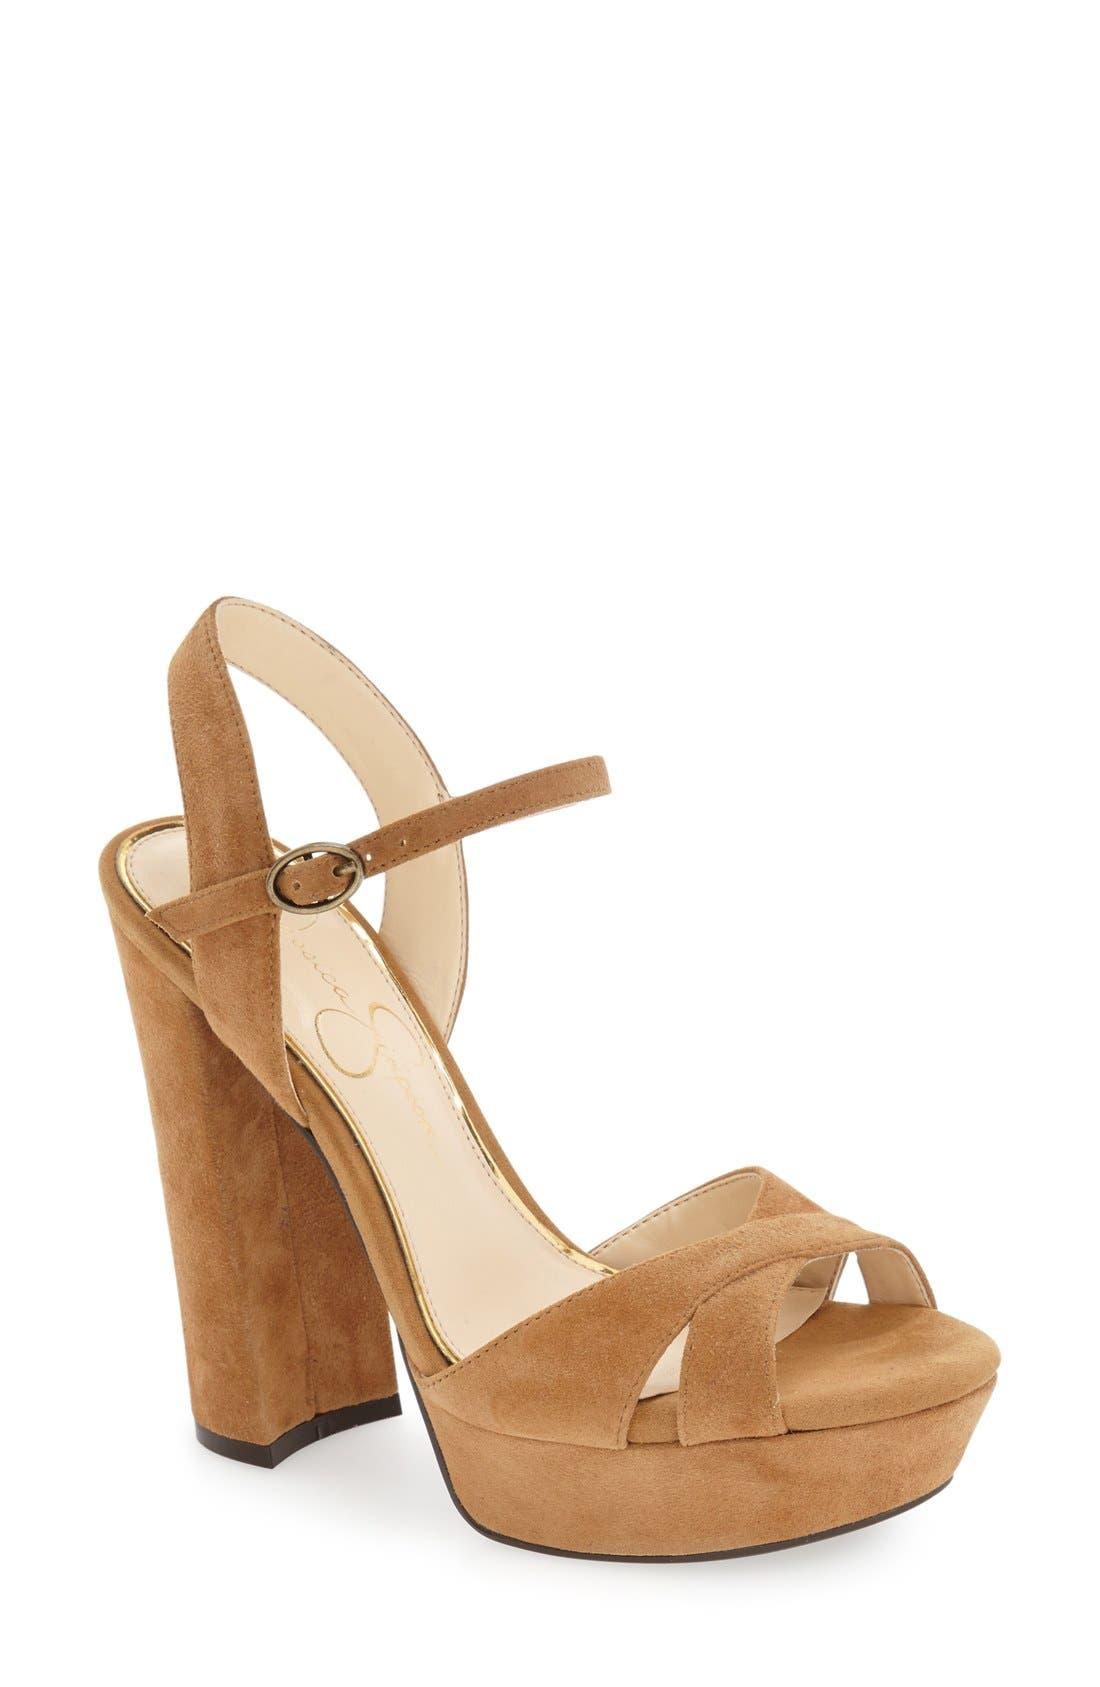 JESSICA SIMPSON 'Naidine' Platform Sandal